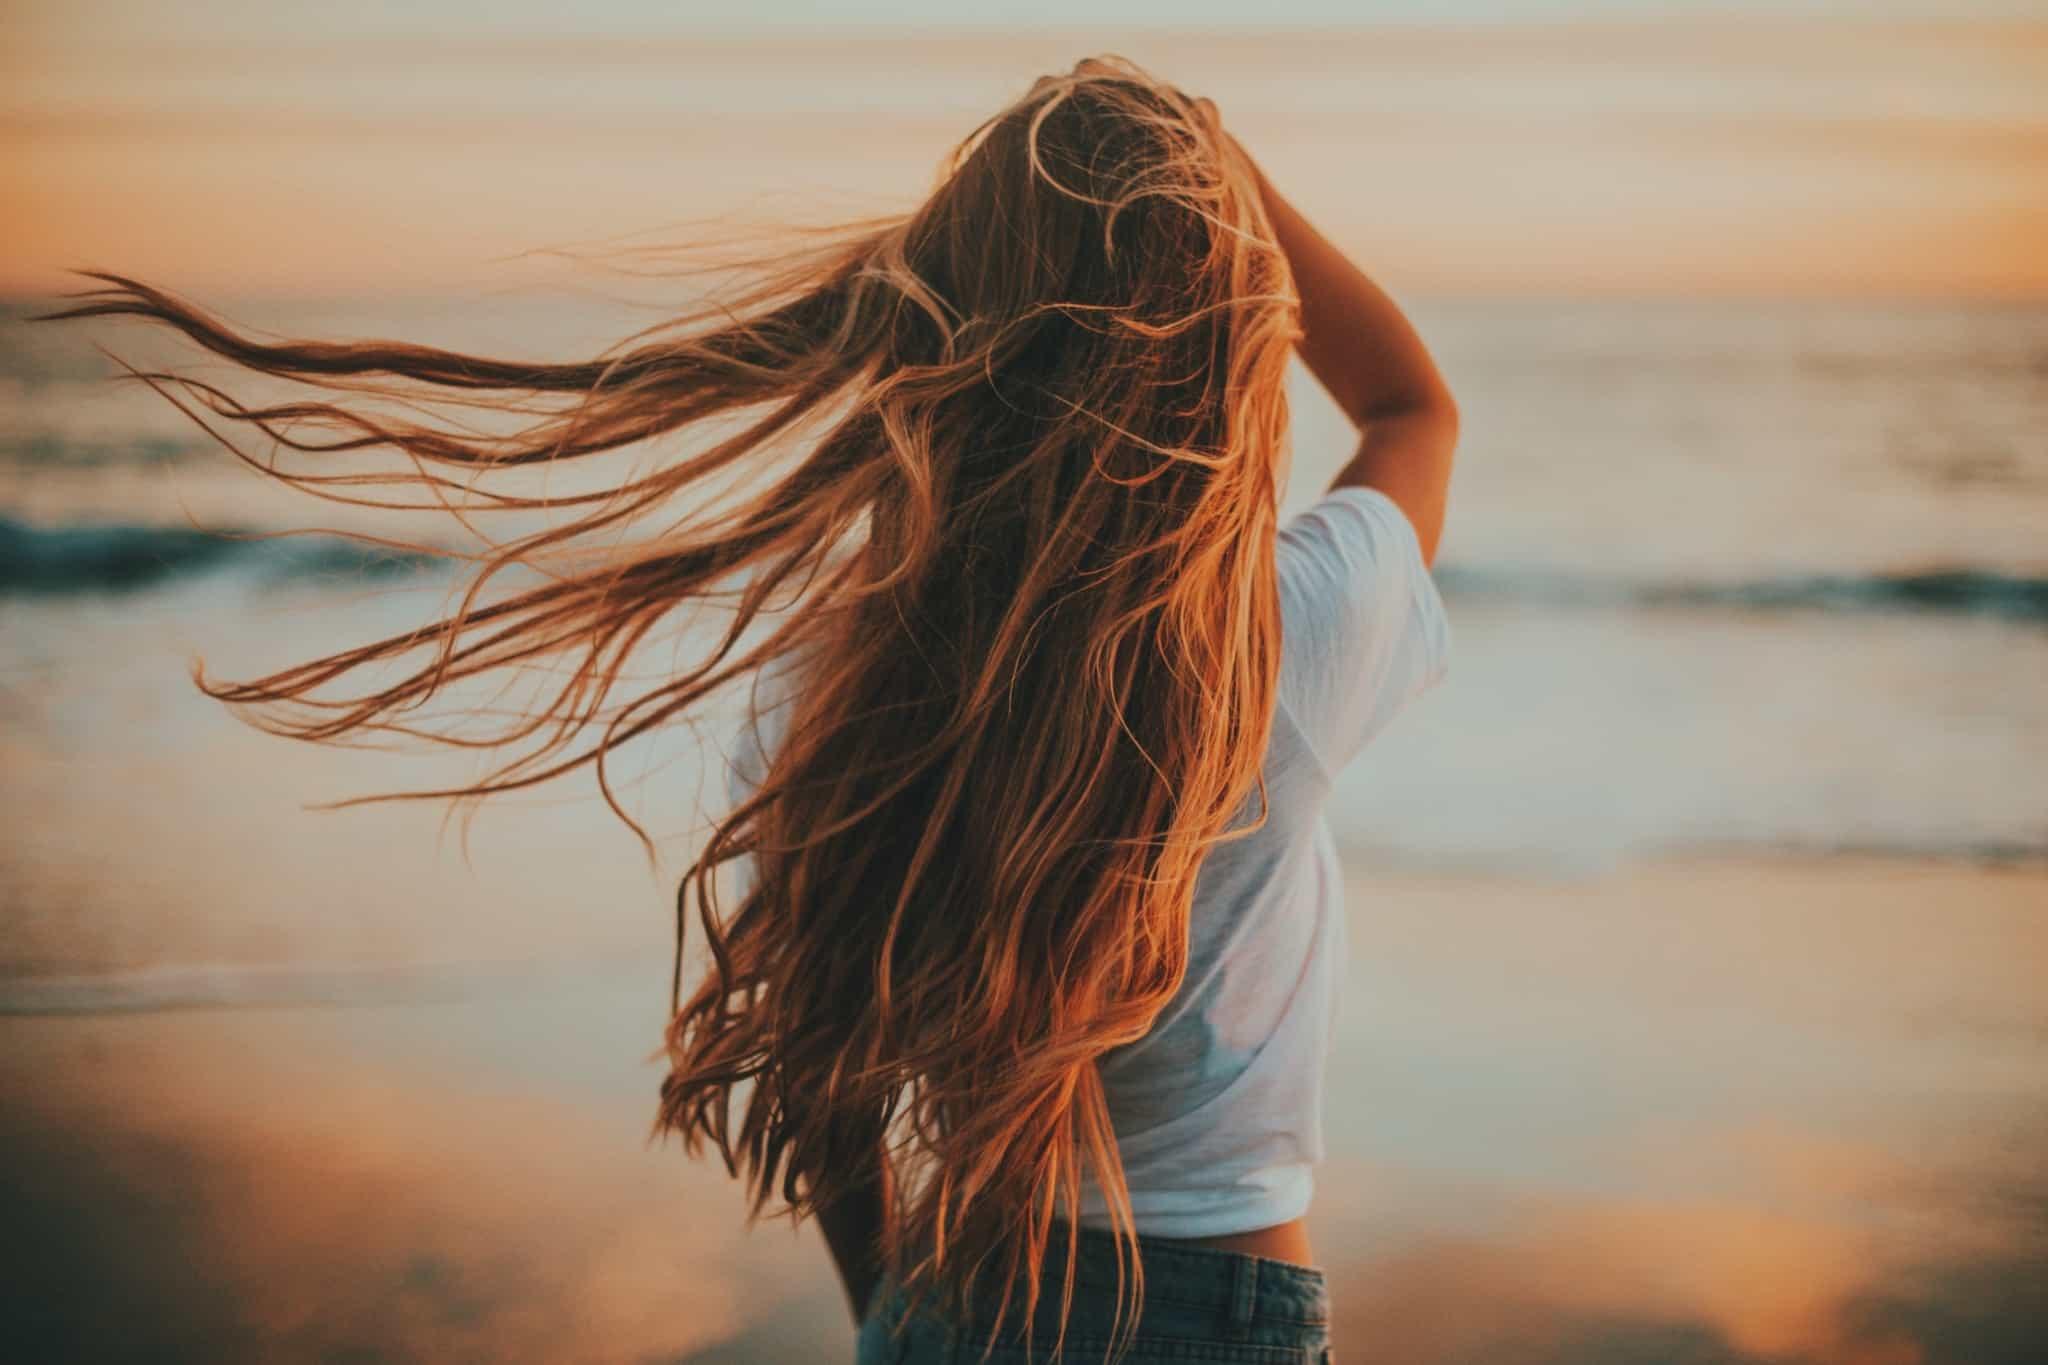 rapariga com cabelo louro comprido